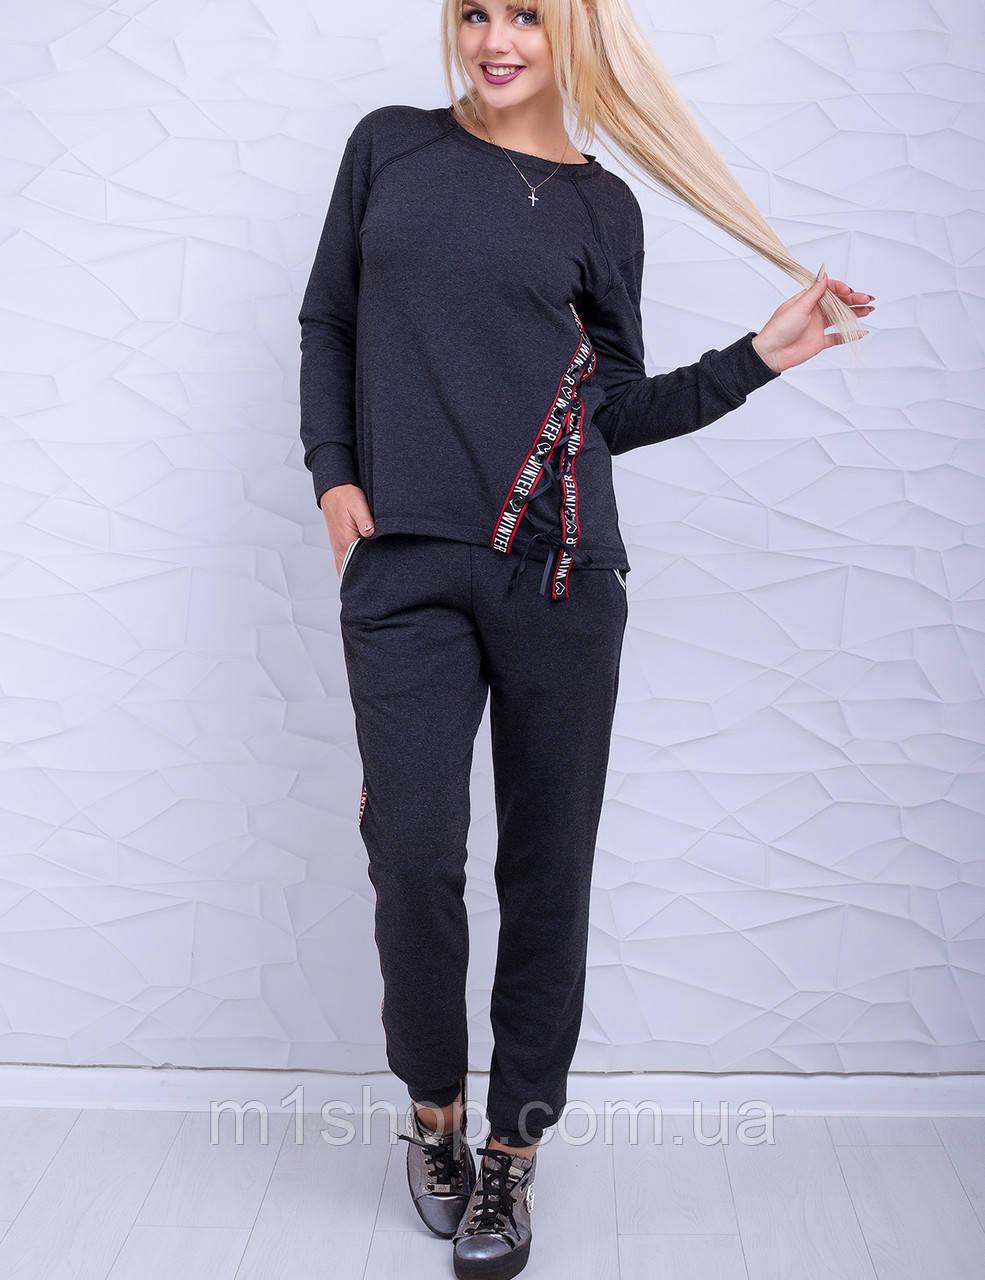 Женский спортивный костюм кофта и брюки (Брайт lzn)